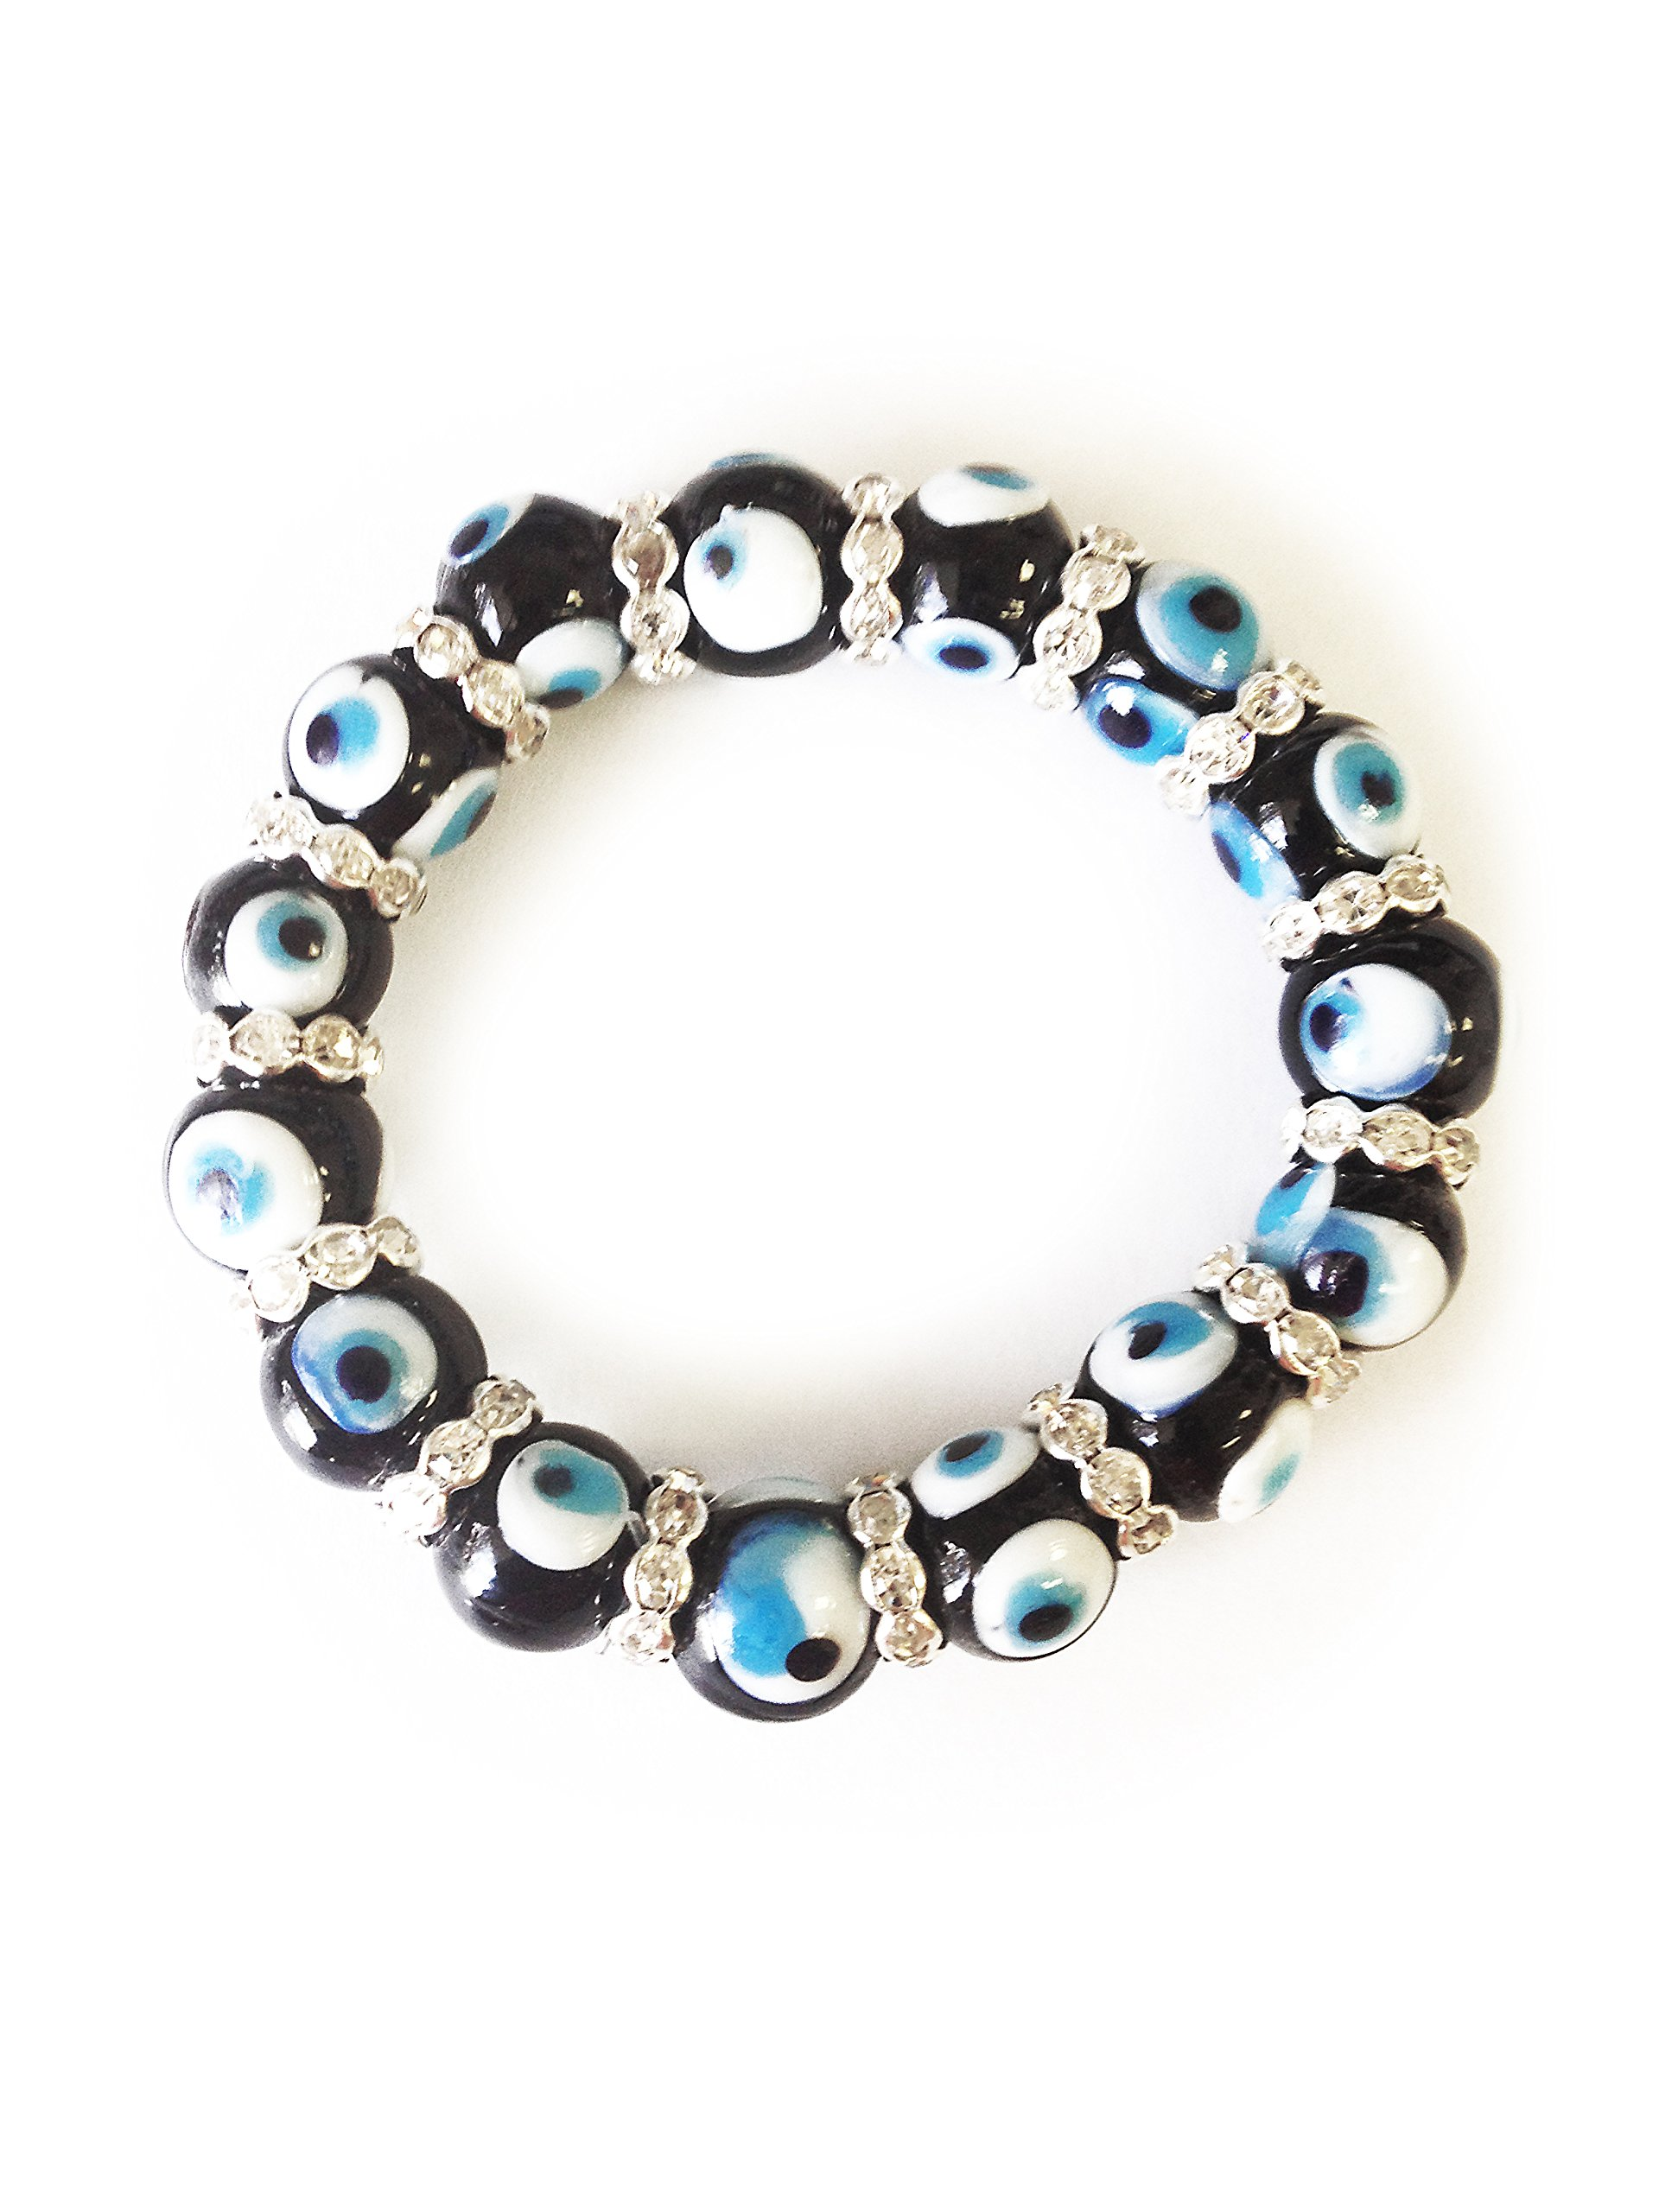 LuckyEye 2734 Bracelet Glass Bead Womens Kabbalah Jewelry for Protection